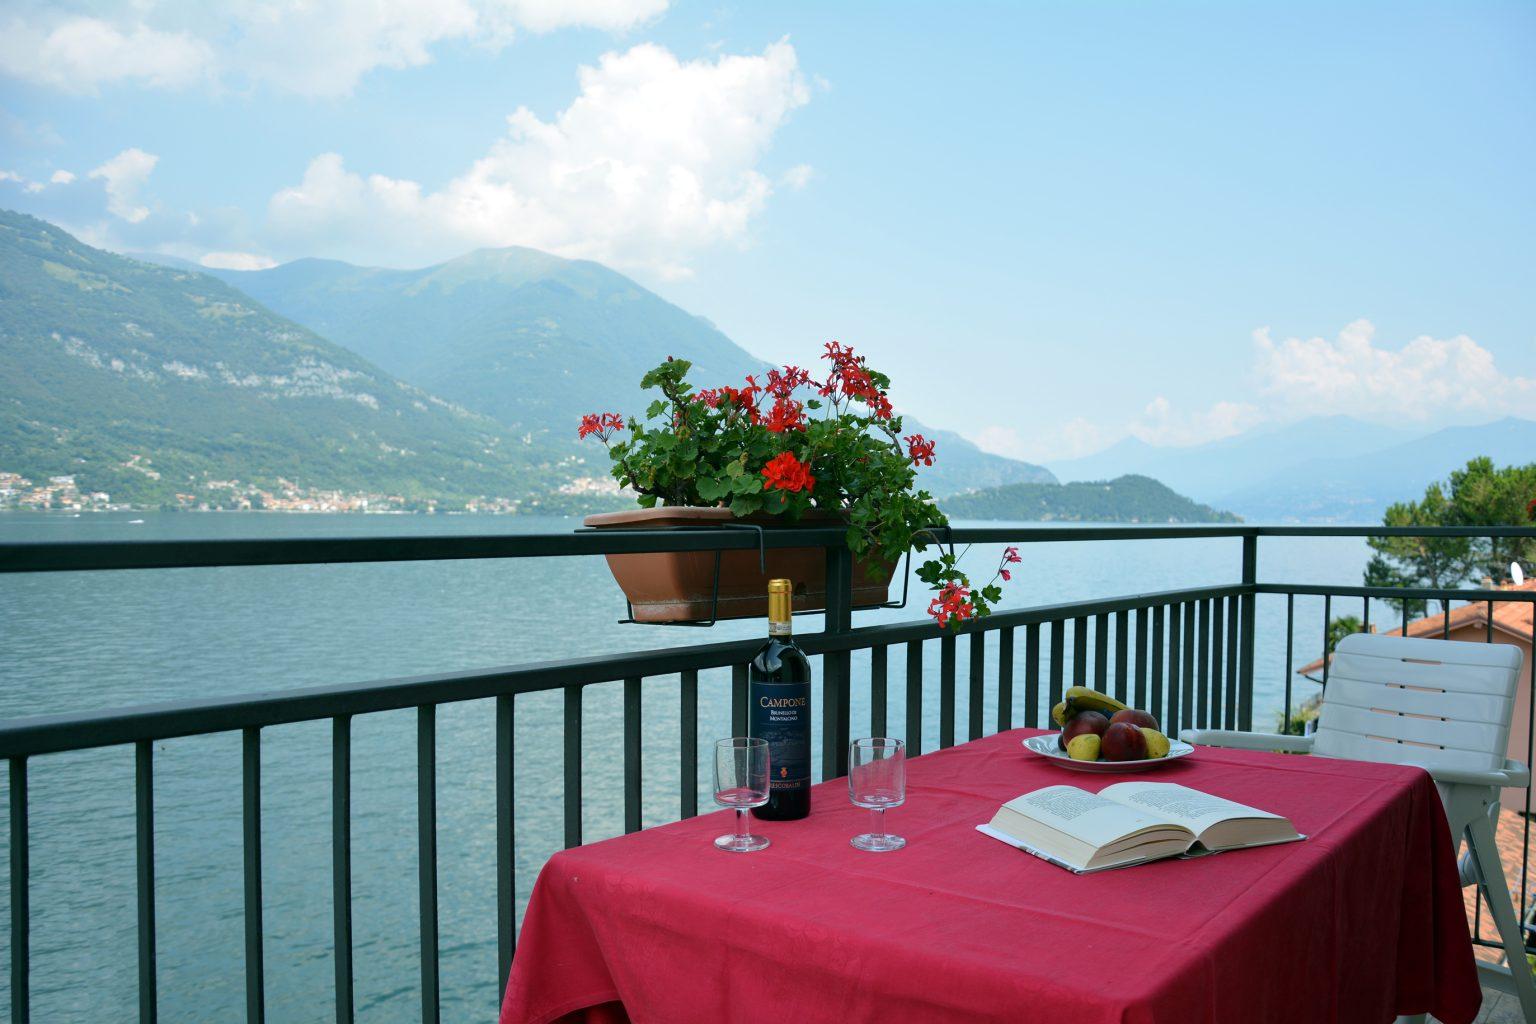 apartment norma balcony on the lake bellagio